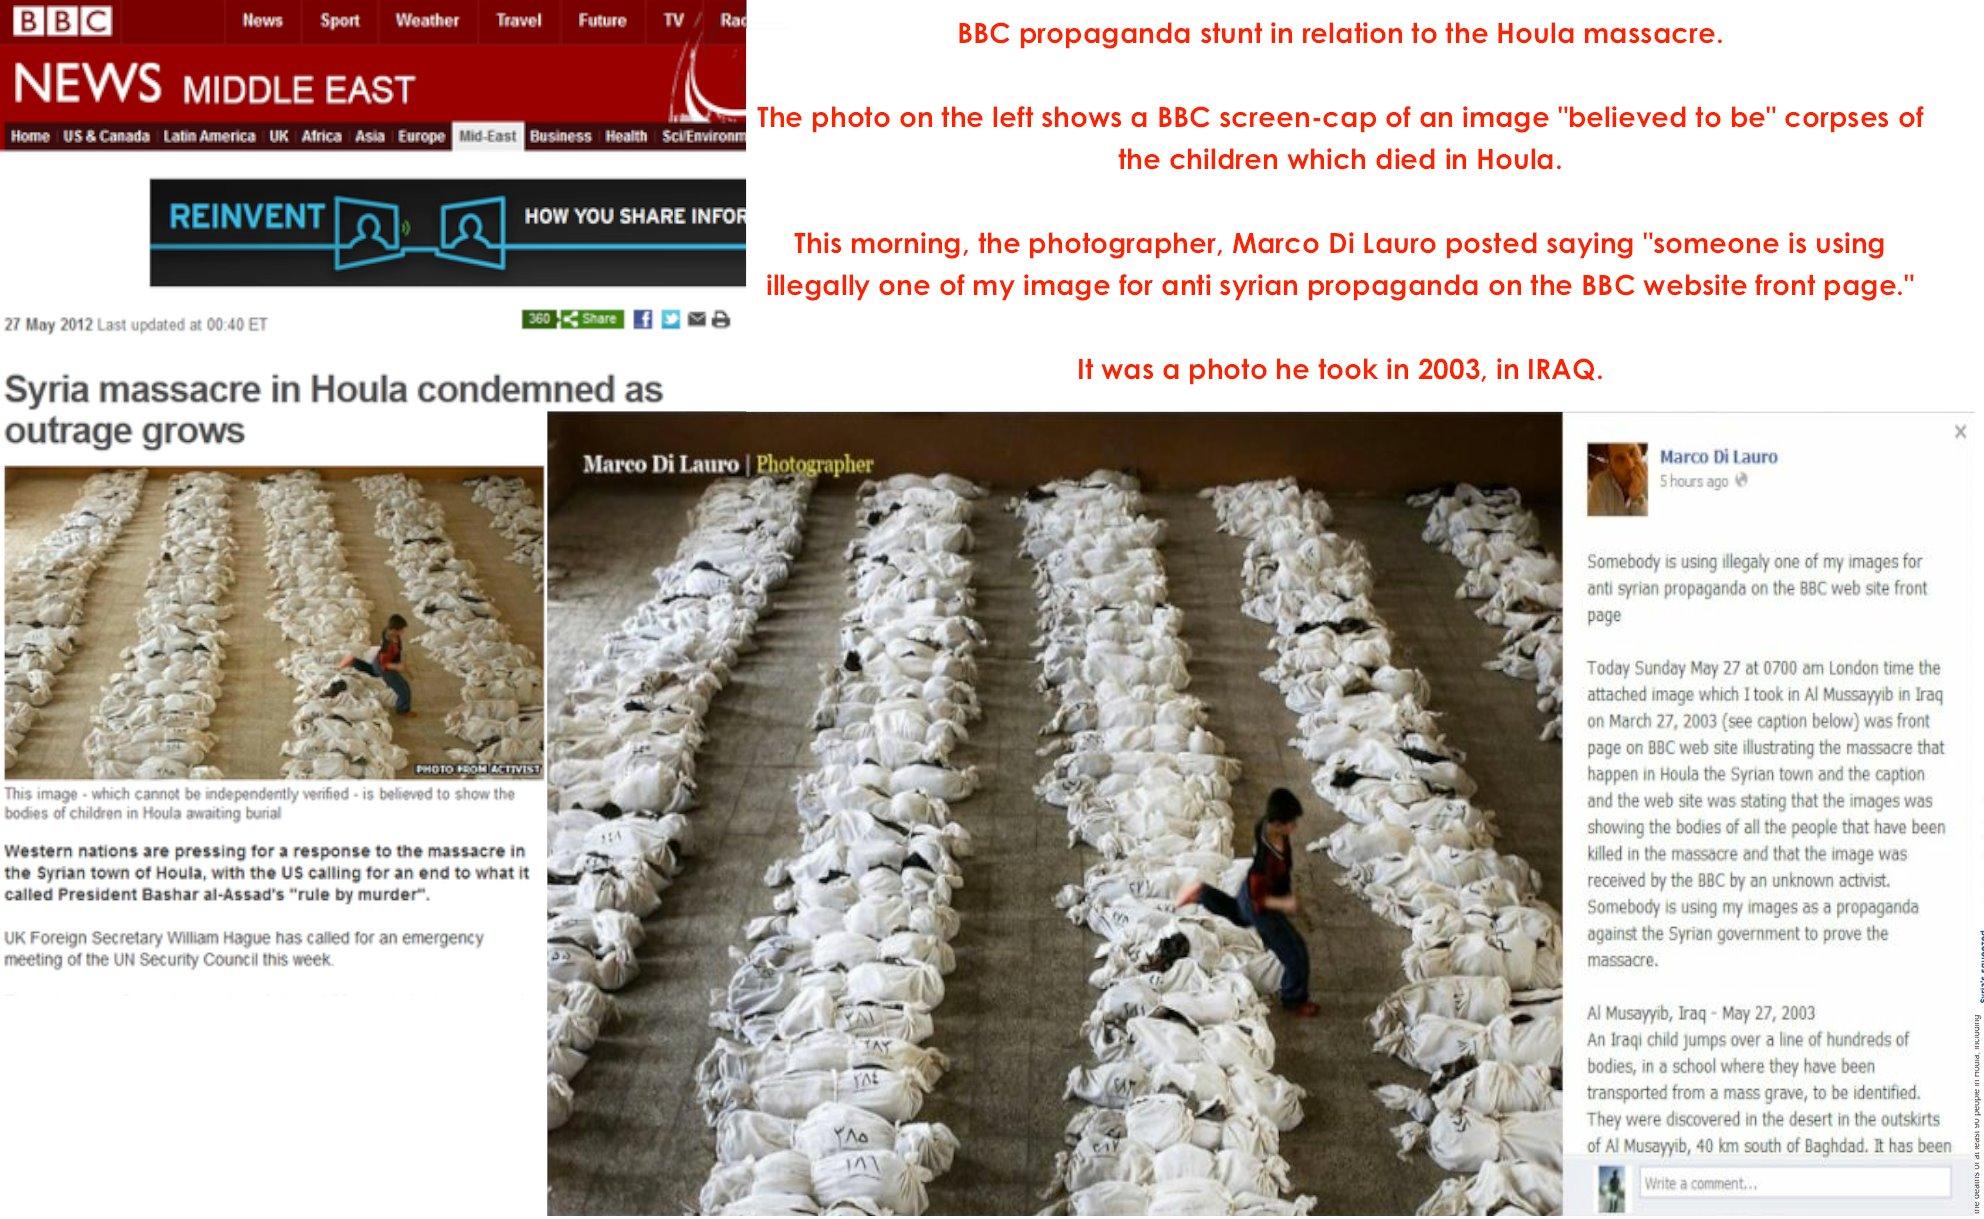 BBC Caught In Syria Massacre Propaganda Hoax